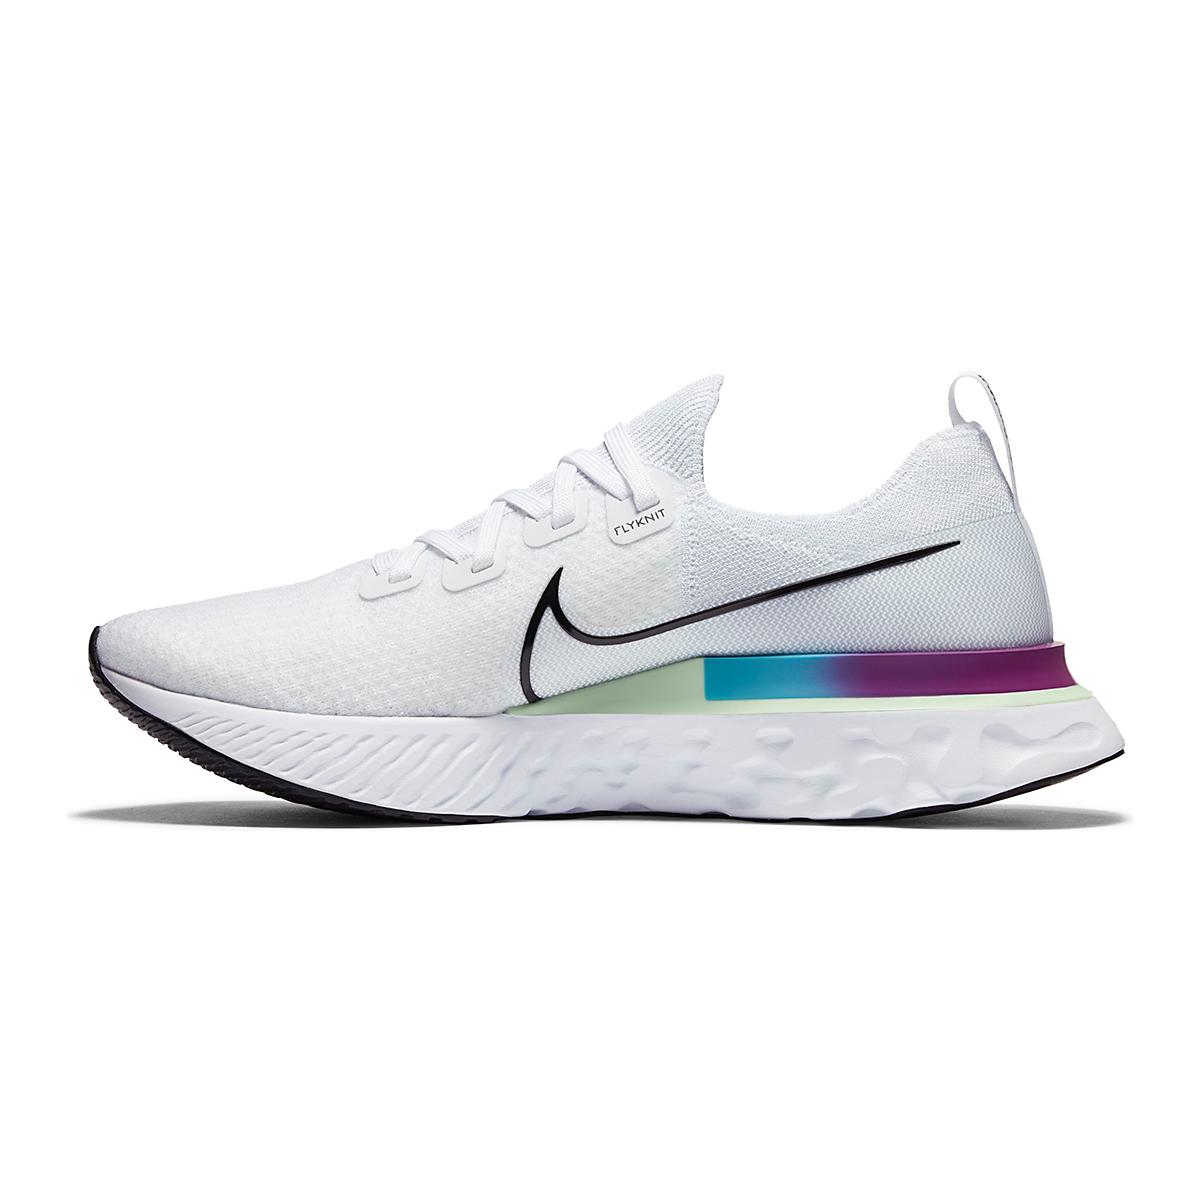 Men's Nike React Infinity Run Flyknit Running Shoes - Color: White/Vapor Green/Oracle Aqua/Black - Size: 6 - Width: Regular, White/Vapor Green/Oracle Aqua/Black, large, image 4